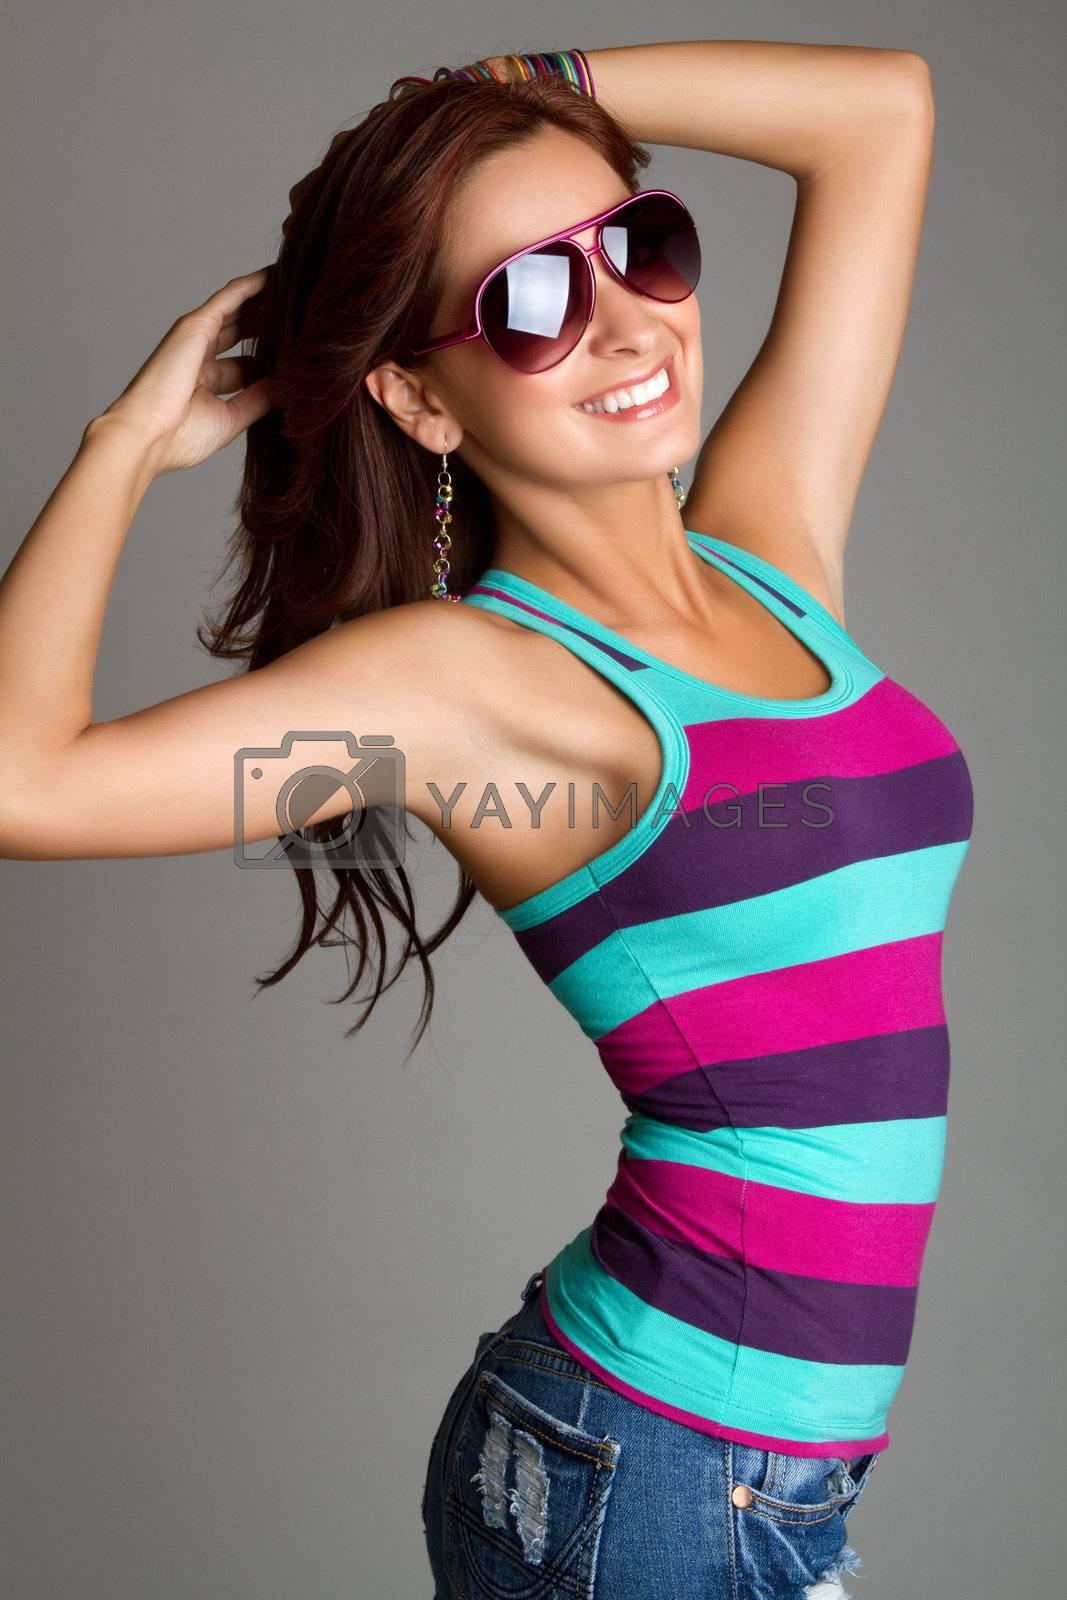 Beautiful smiling woman wearing sunglasses